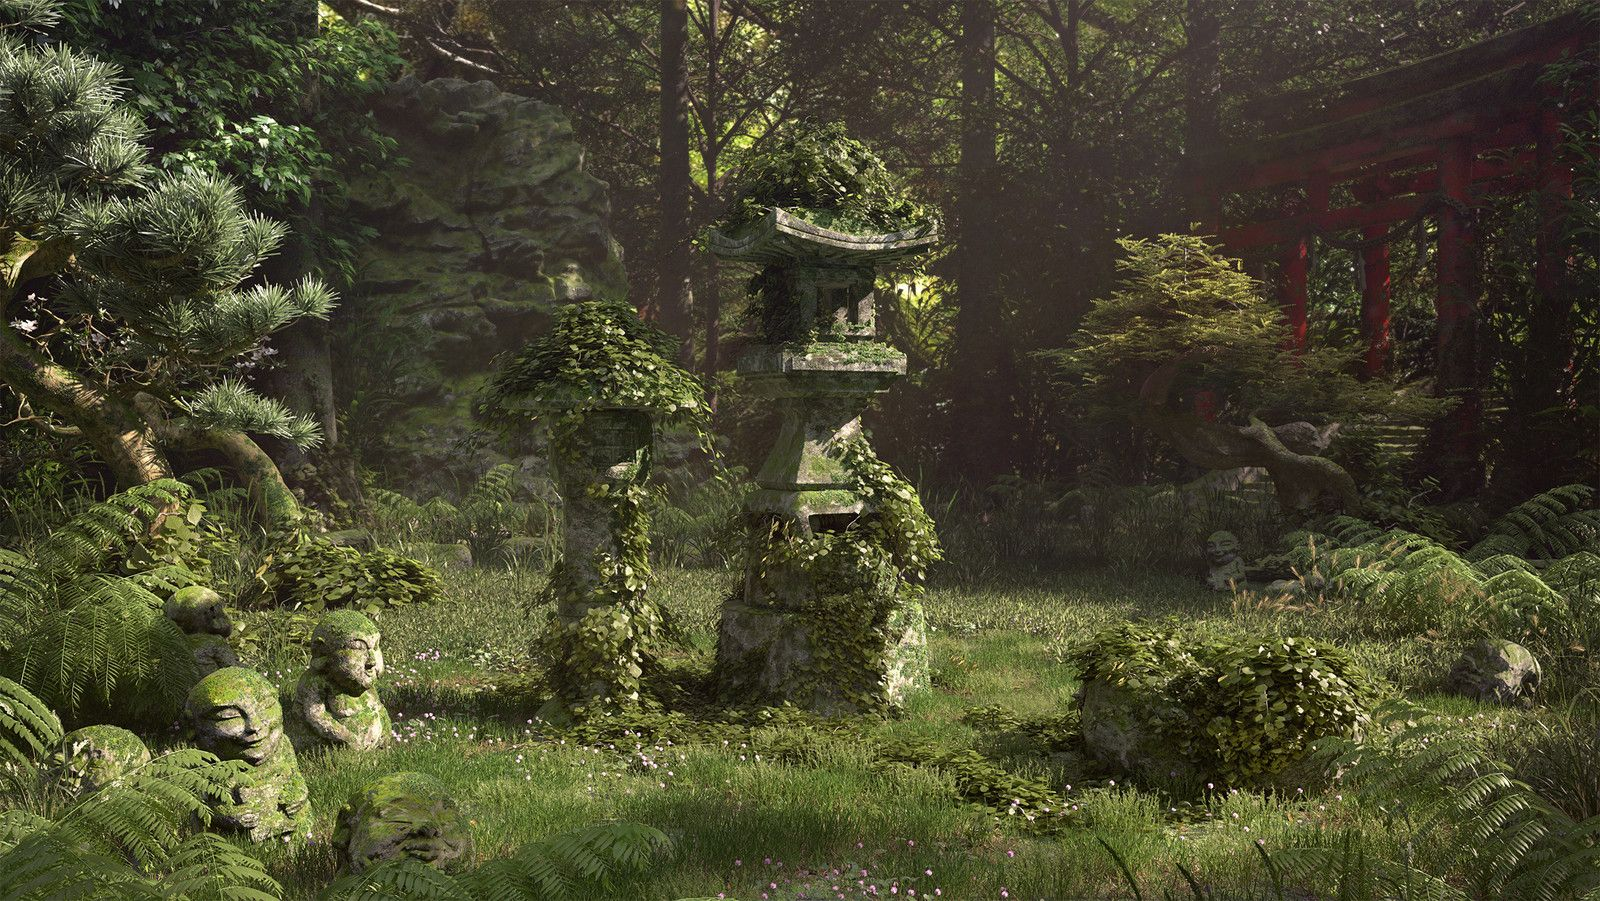 lost garden, Rodrigue Pralier on ArtStation at https://www.artstation.com/artwork/85l2m?utm_campaign=notify&utm_medium=email&utm_source=notifications_mailer